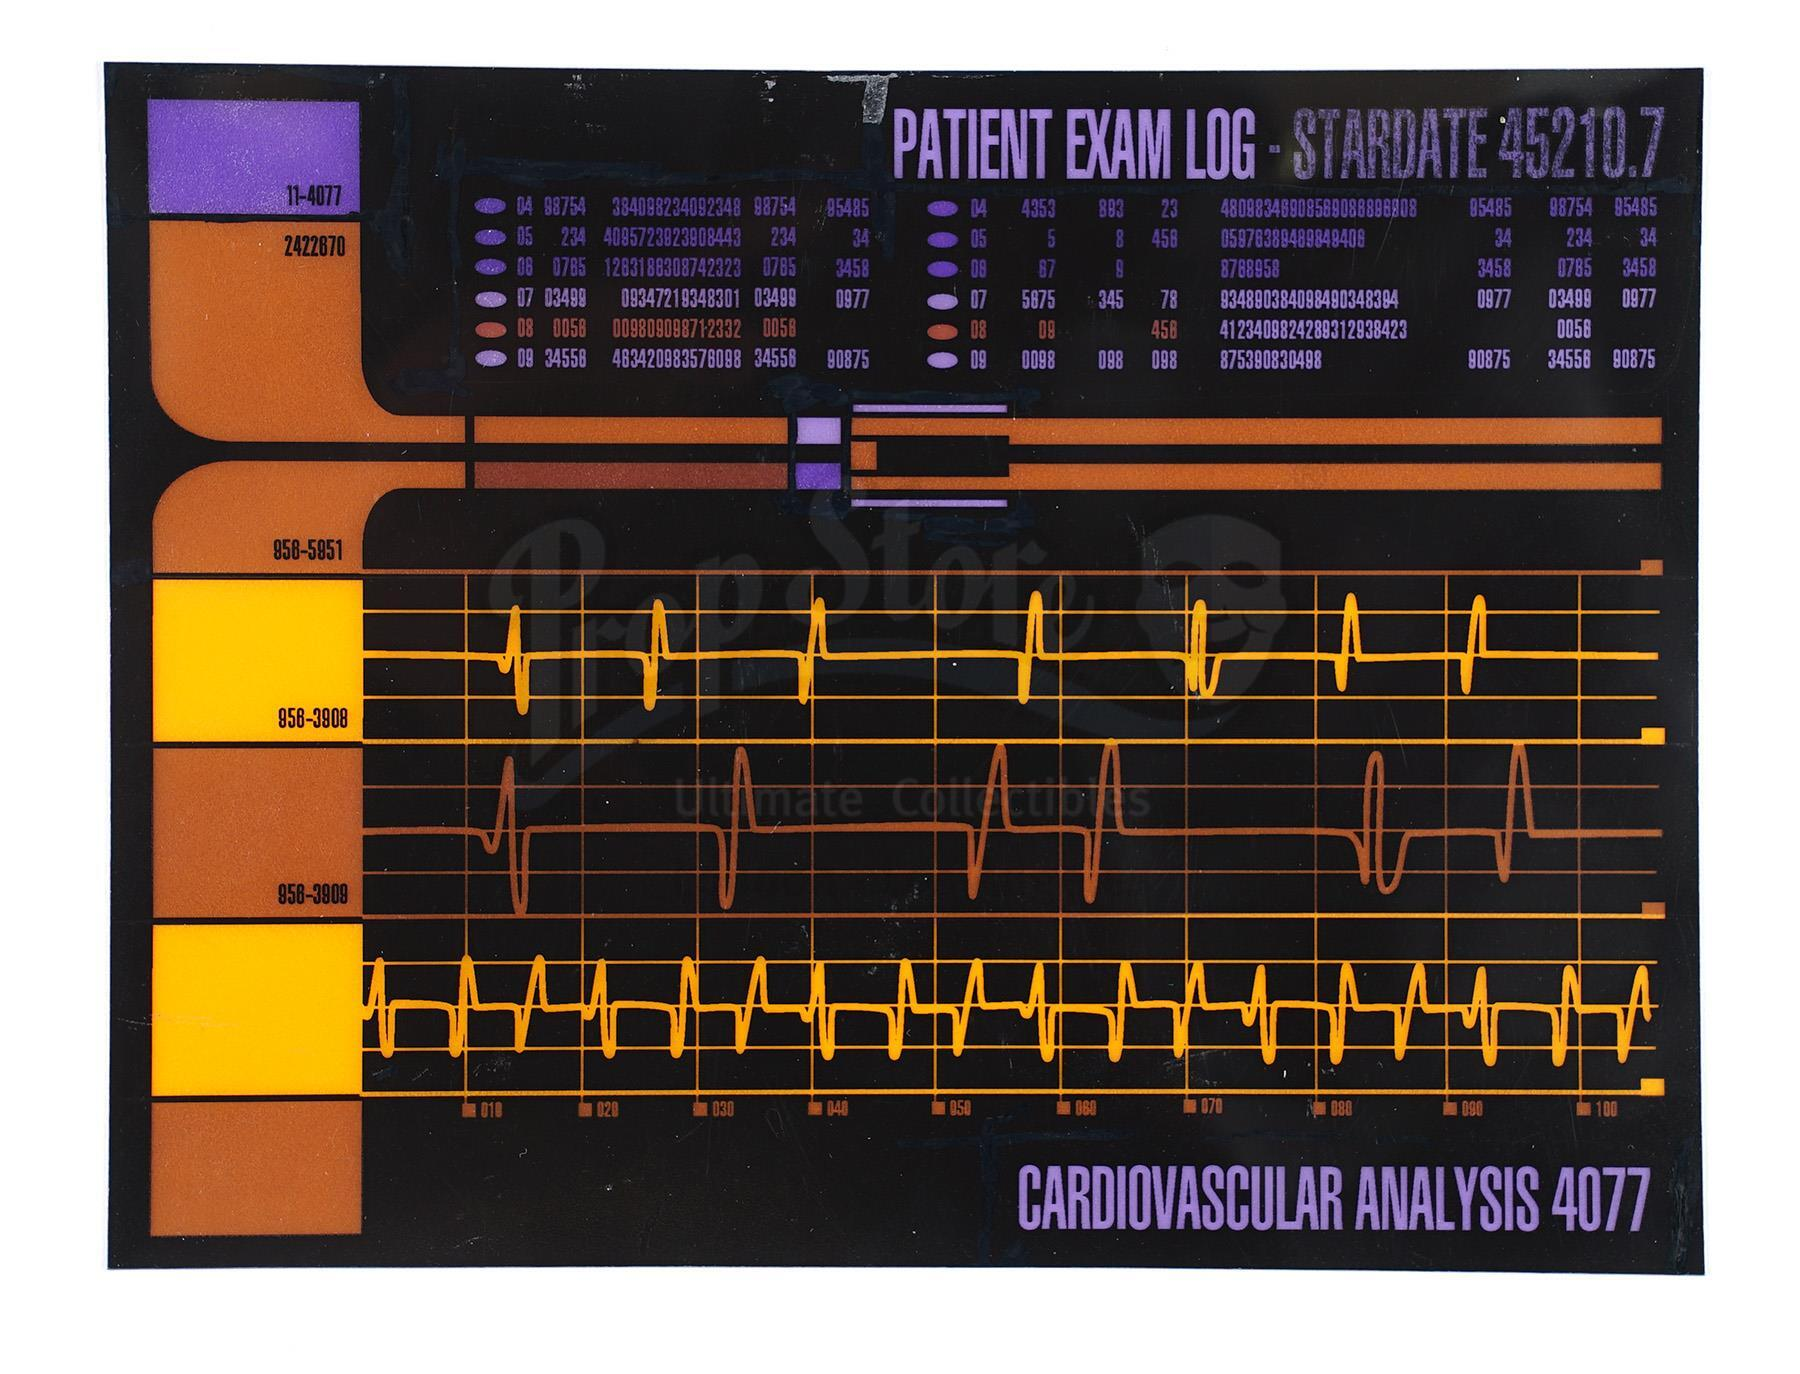 Lot # 1065: STAR TREK: THE NEXT GENERATION - Medical LCARS Panel of Jean-Luc Picard's (Patrick Stewa